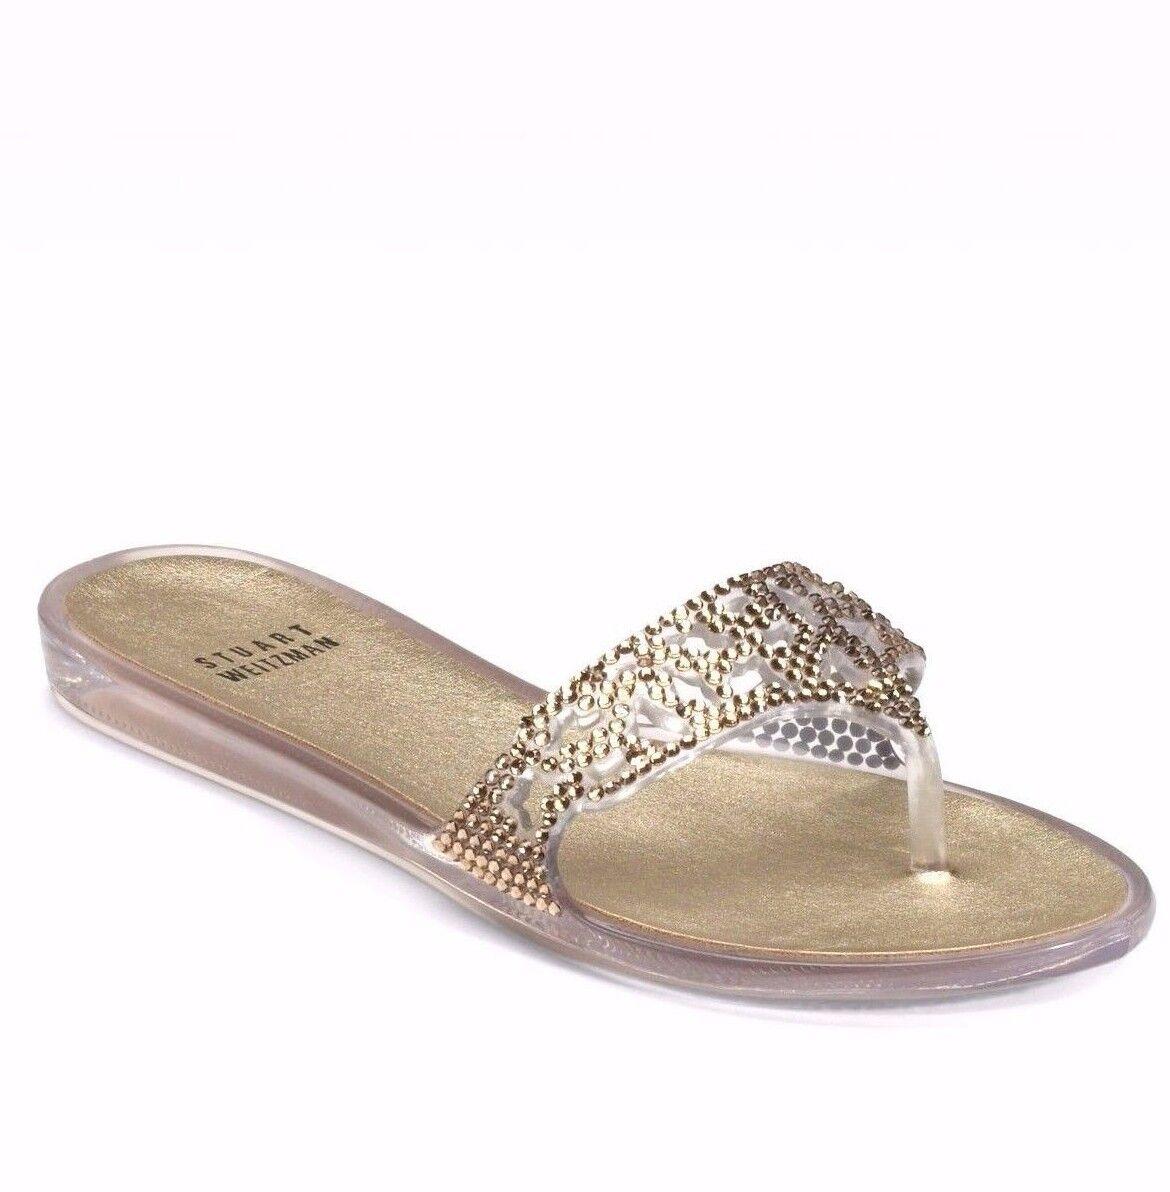 Stuart Weitzman Clear Gold On The Rocks Crystal Stones Jelly Flip Flop Sandals 8